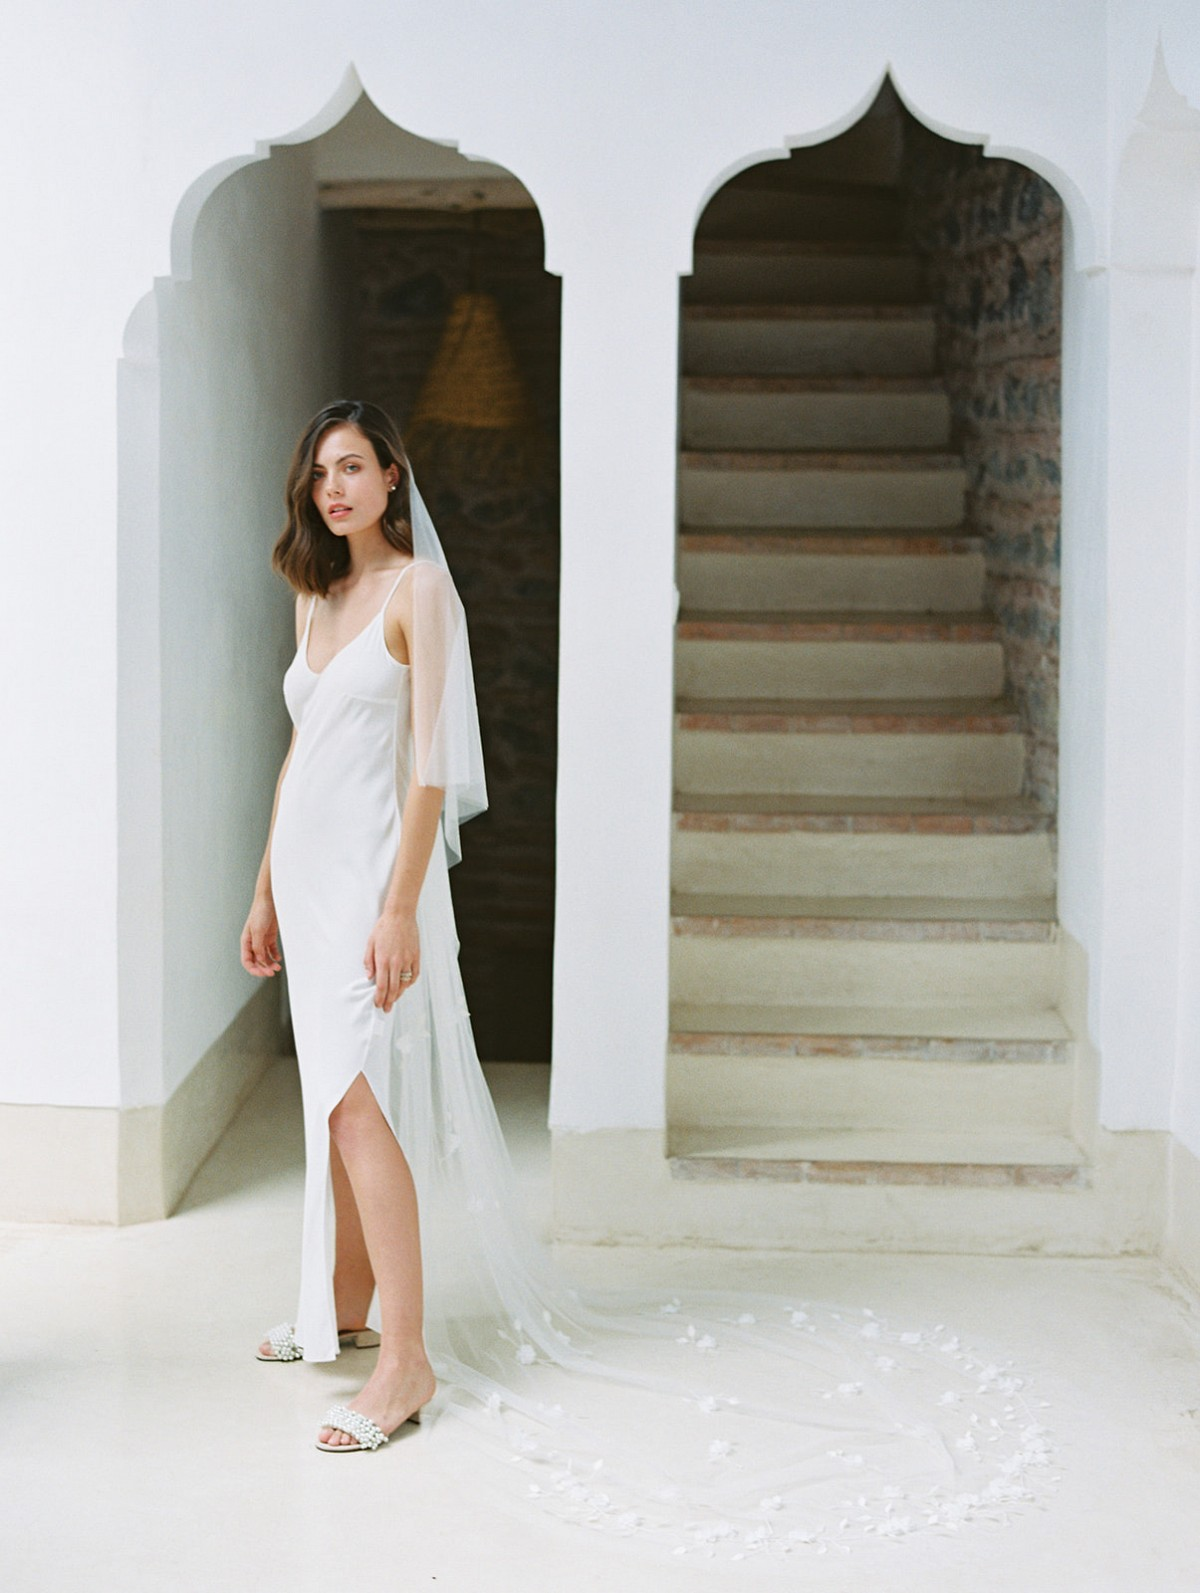 Chic bohemian honeymoon looks for the modern bride